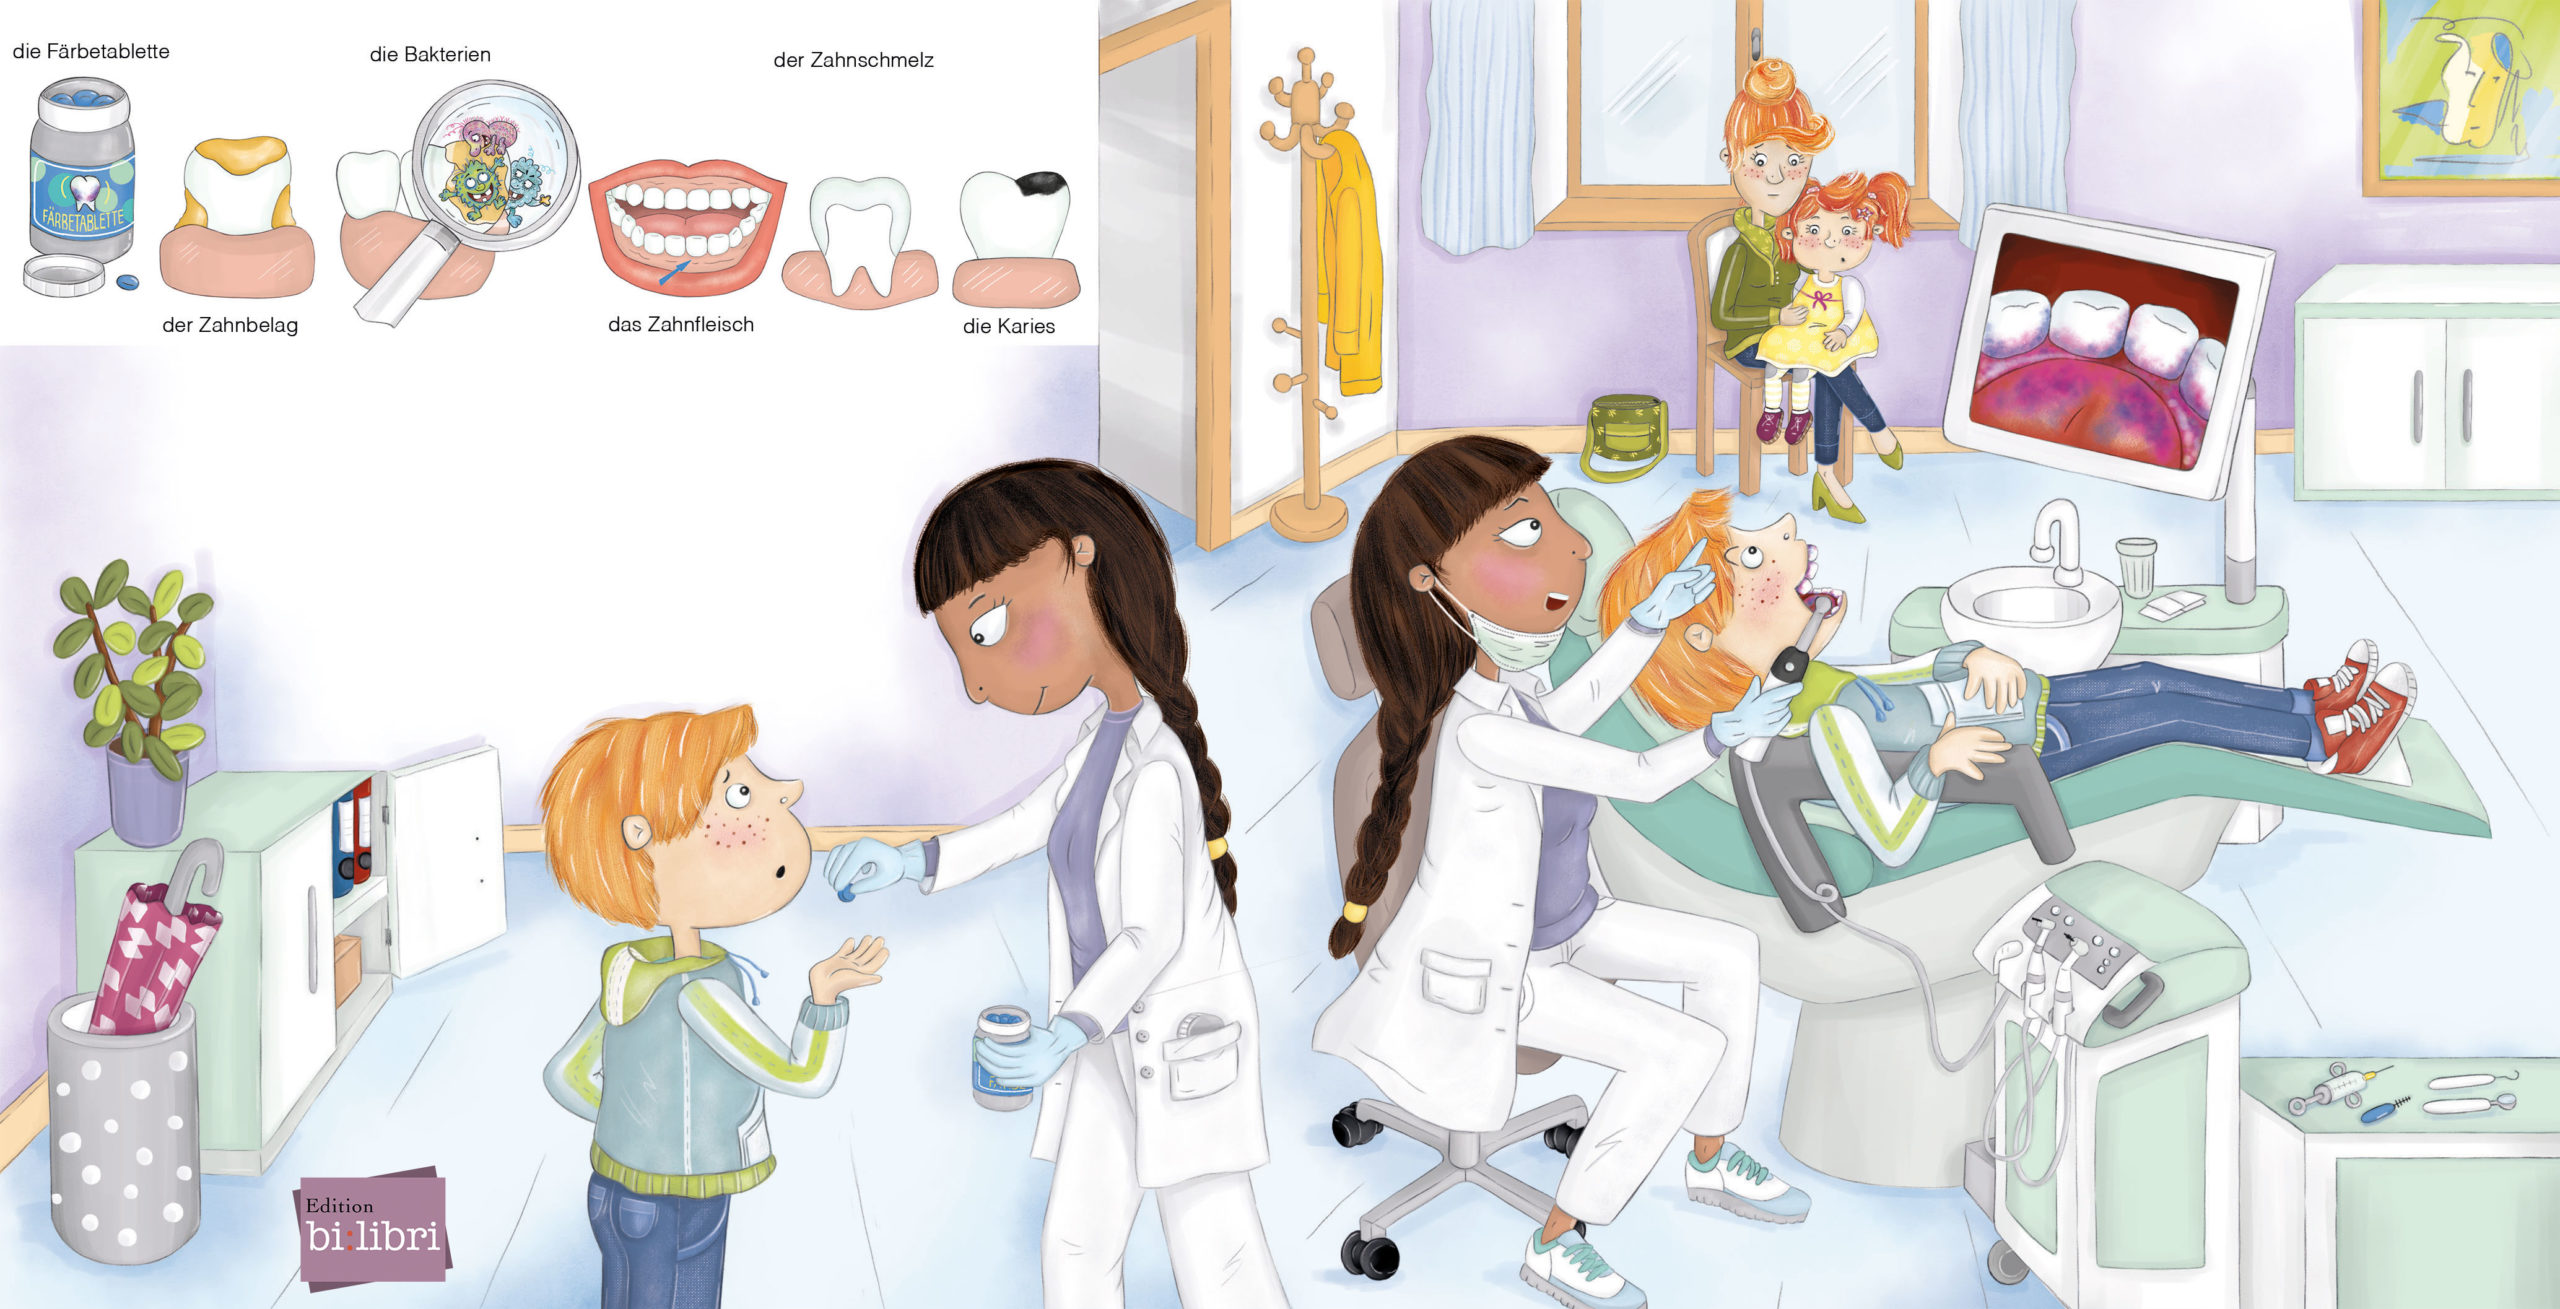 beim Zahnarzt, bilibrini, Verlag Edition Bi:libri, Kinderbuch, Evelyn Faulhaber Illustration